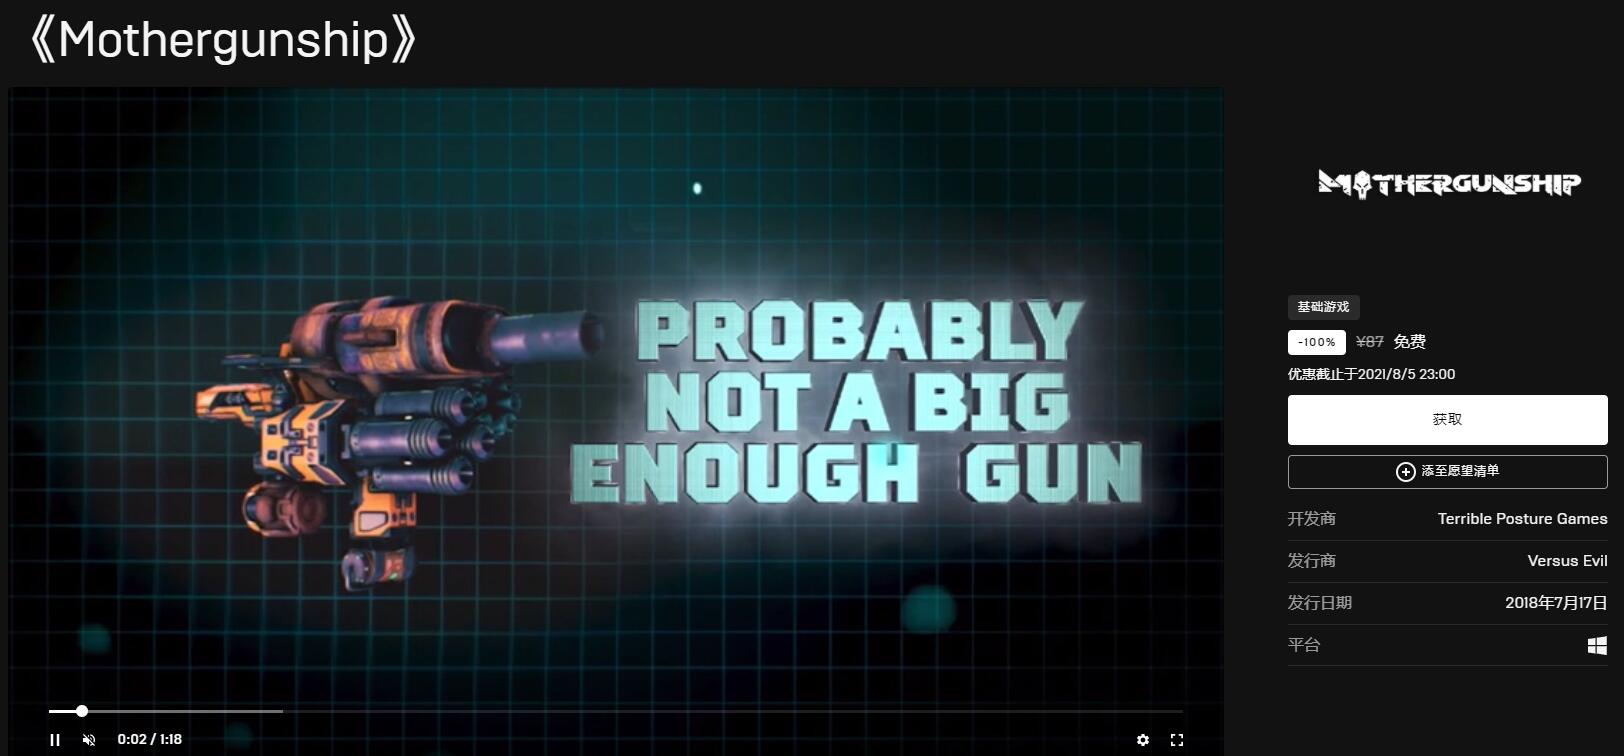 Epic喜+2免费领《重炮母舰》《模拟火车世界2》-QQ前线乐园